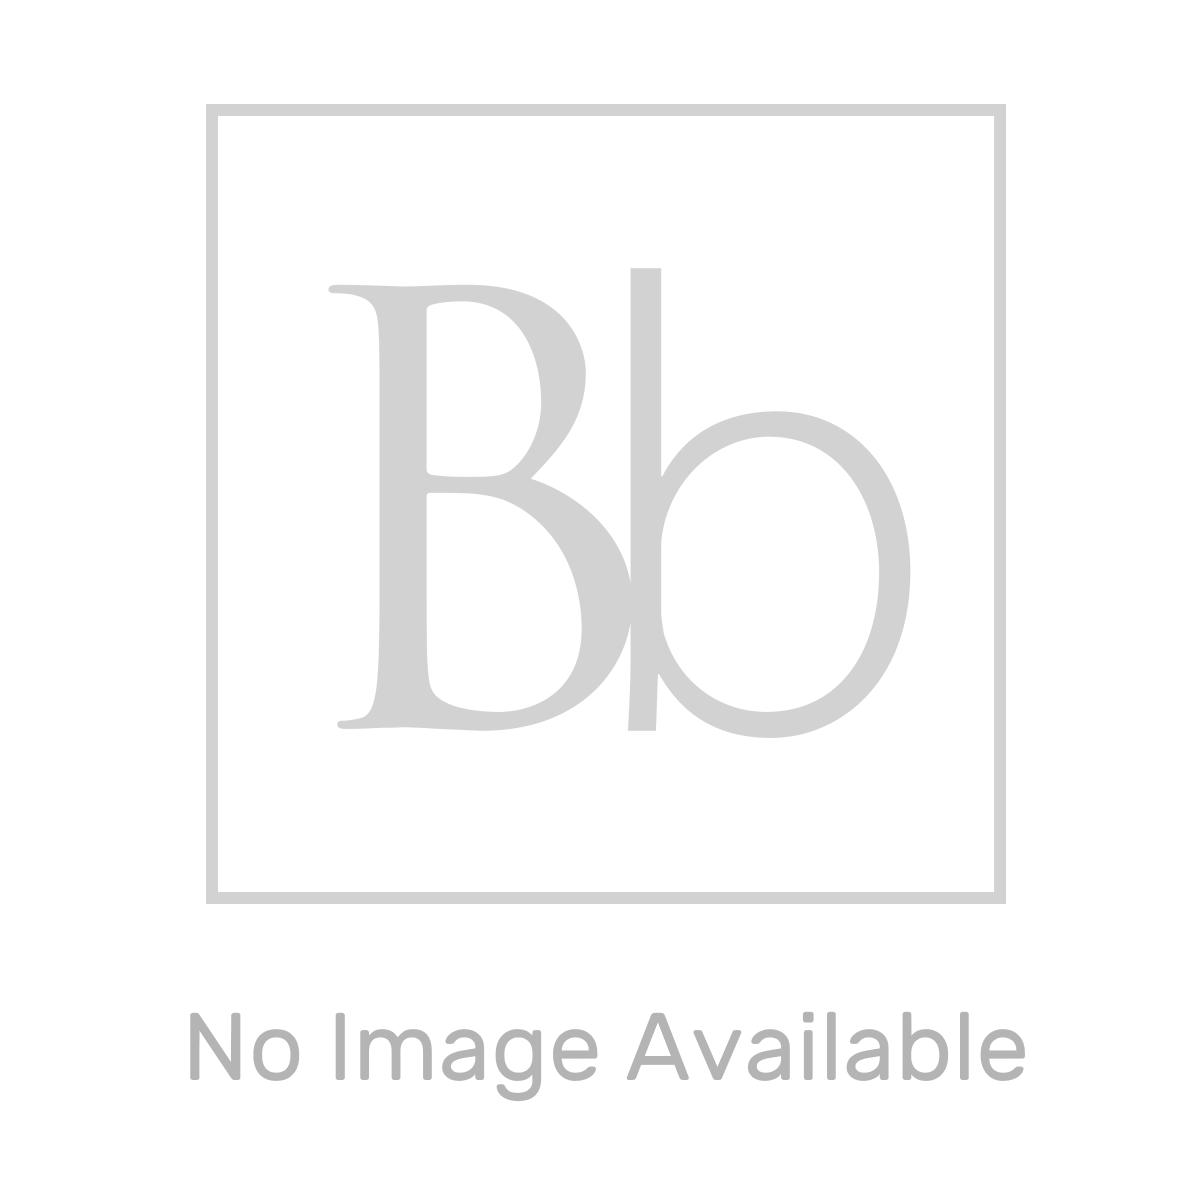 RAK Sensation Gloss White 0 Tap Hole Freestanding Basin 600mm Measurements